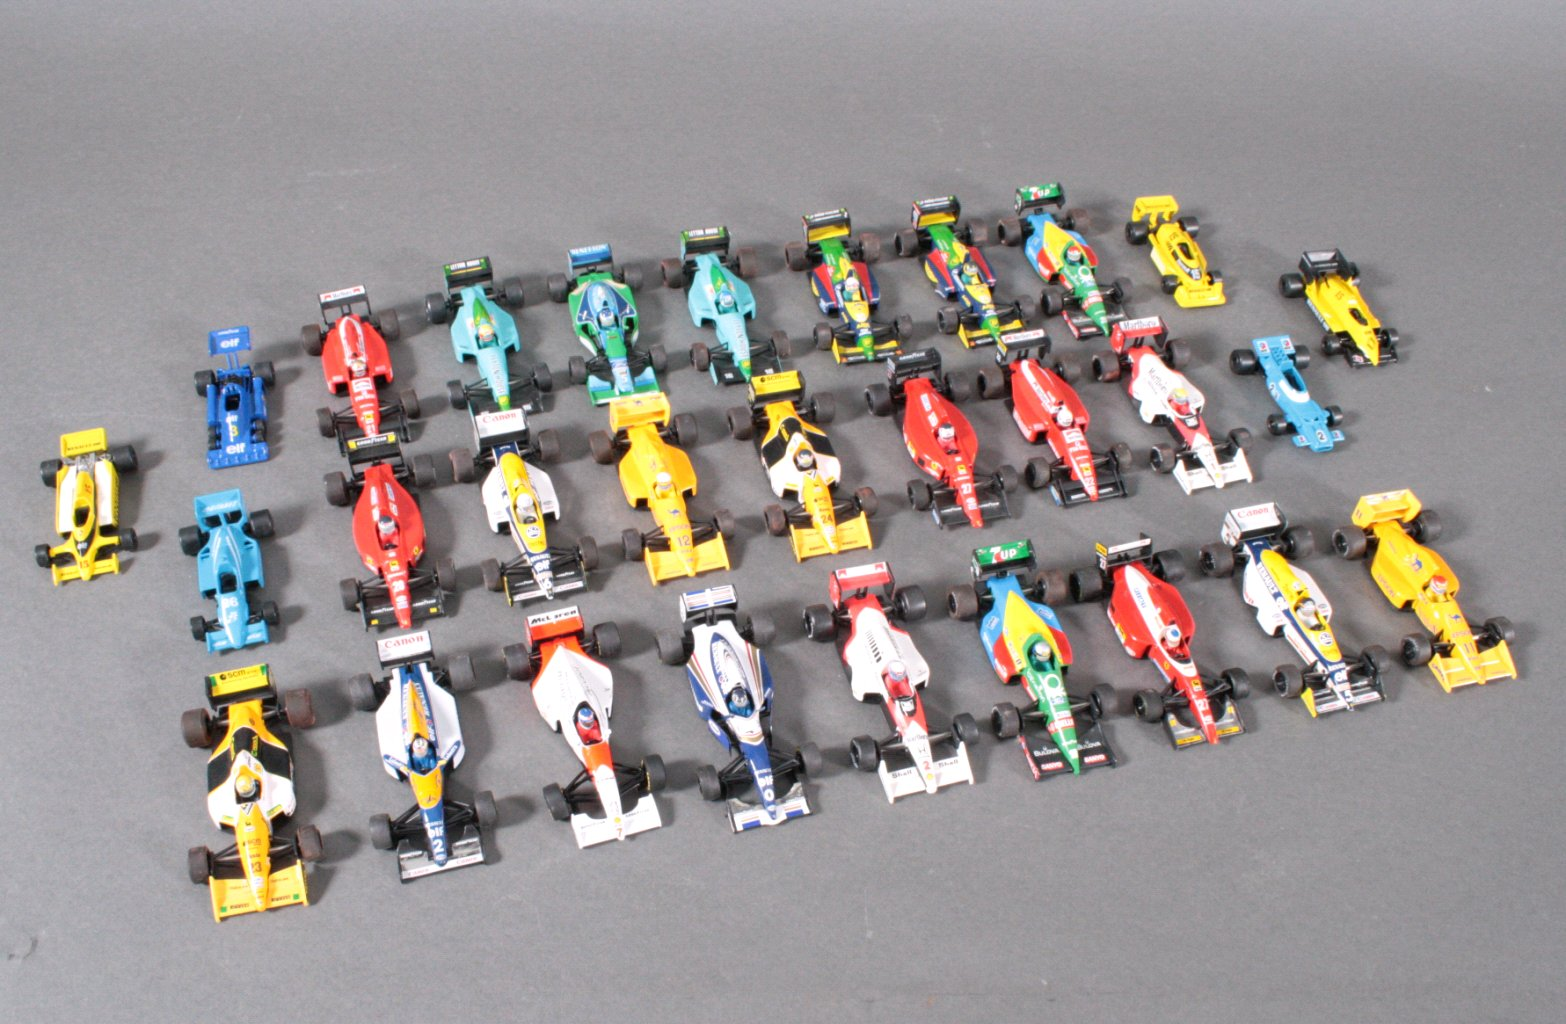 Sammlung F1 Fahrzeuge, Maßstab 1:43